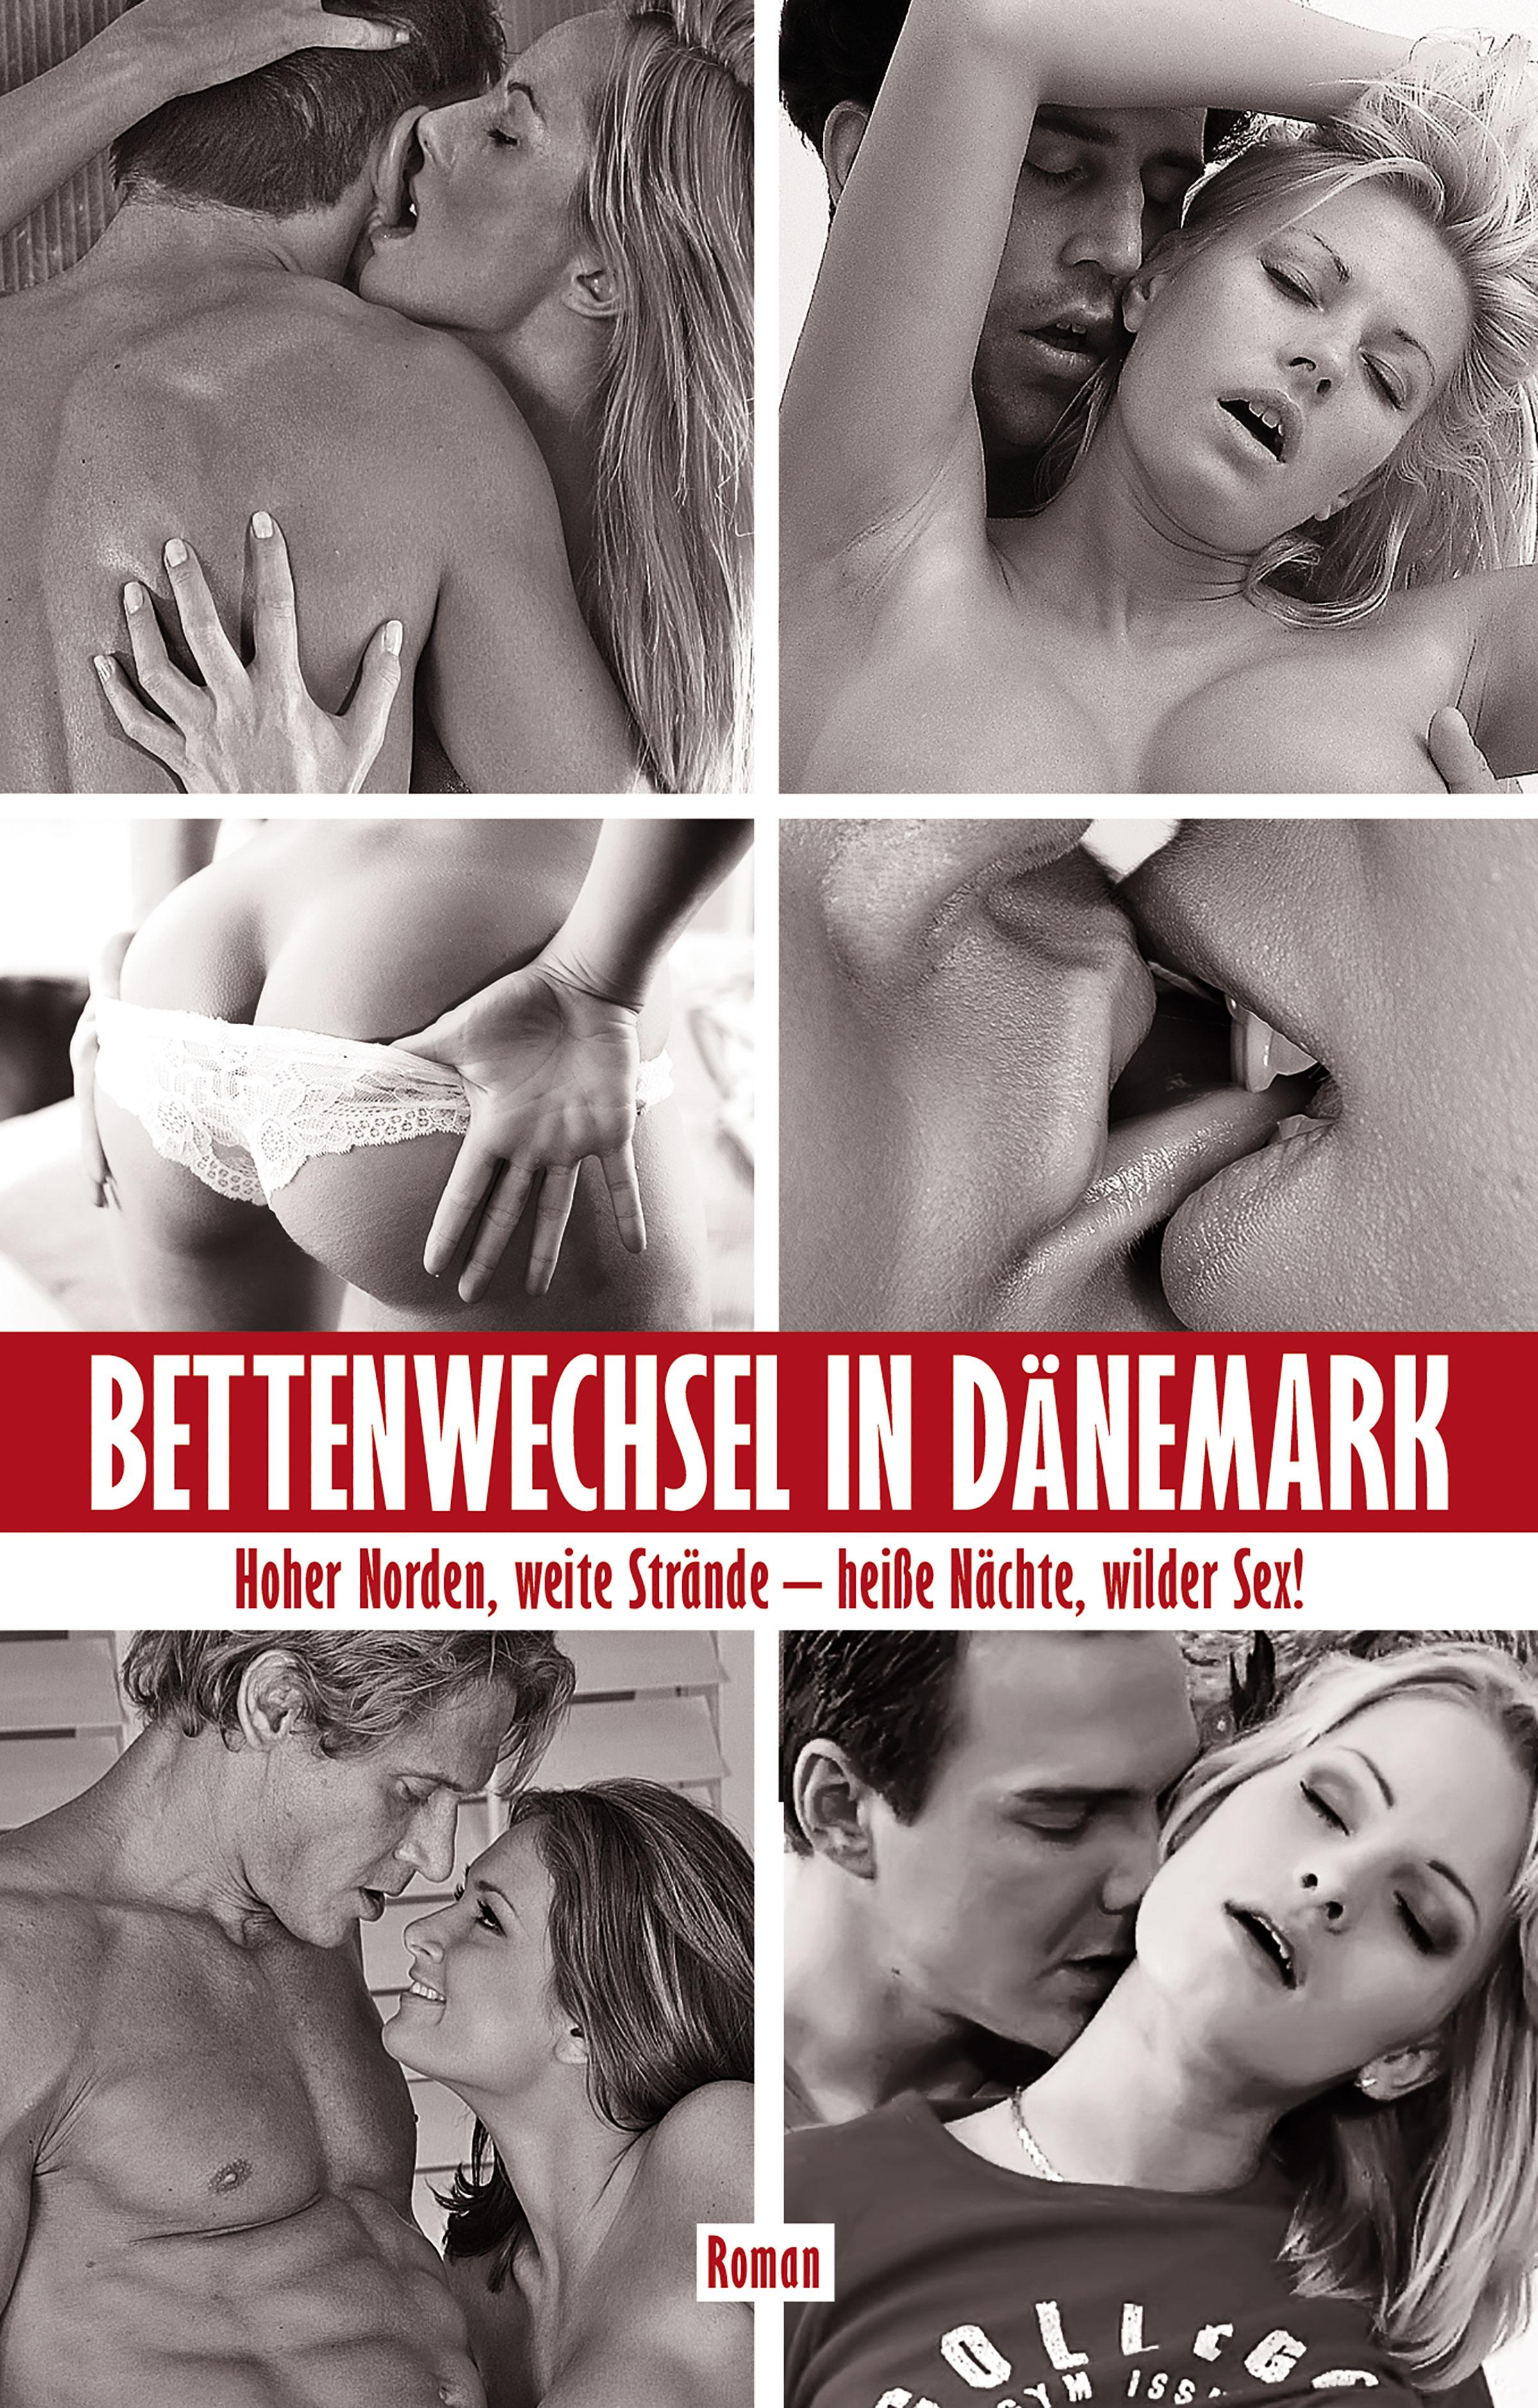 Diane Bertini Bettenwechsel in Dänemark все цены